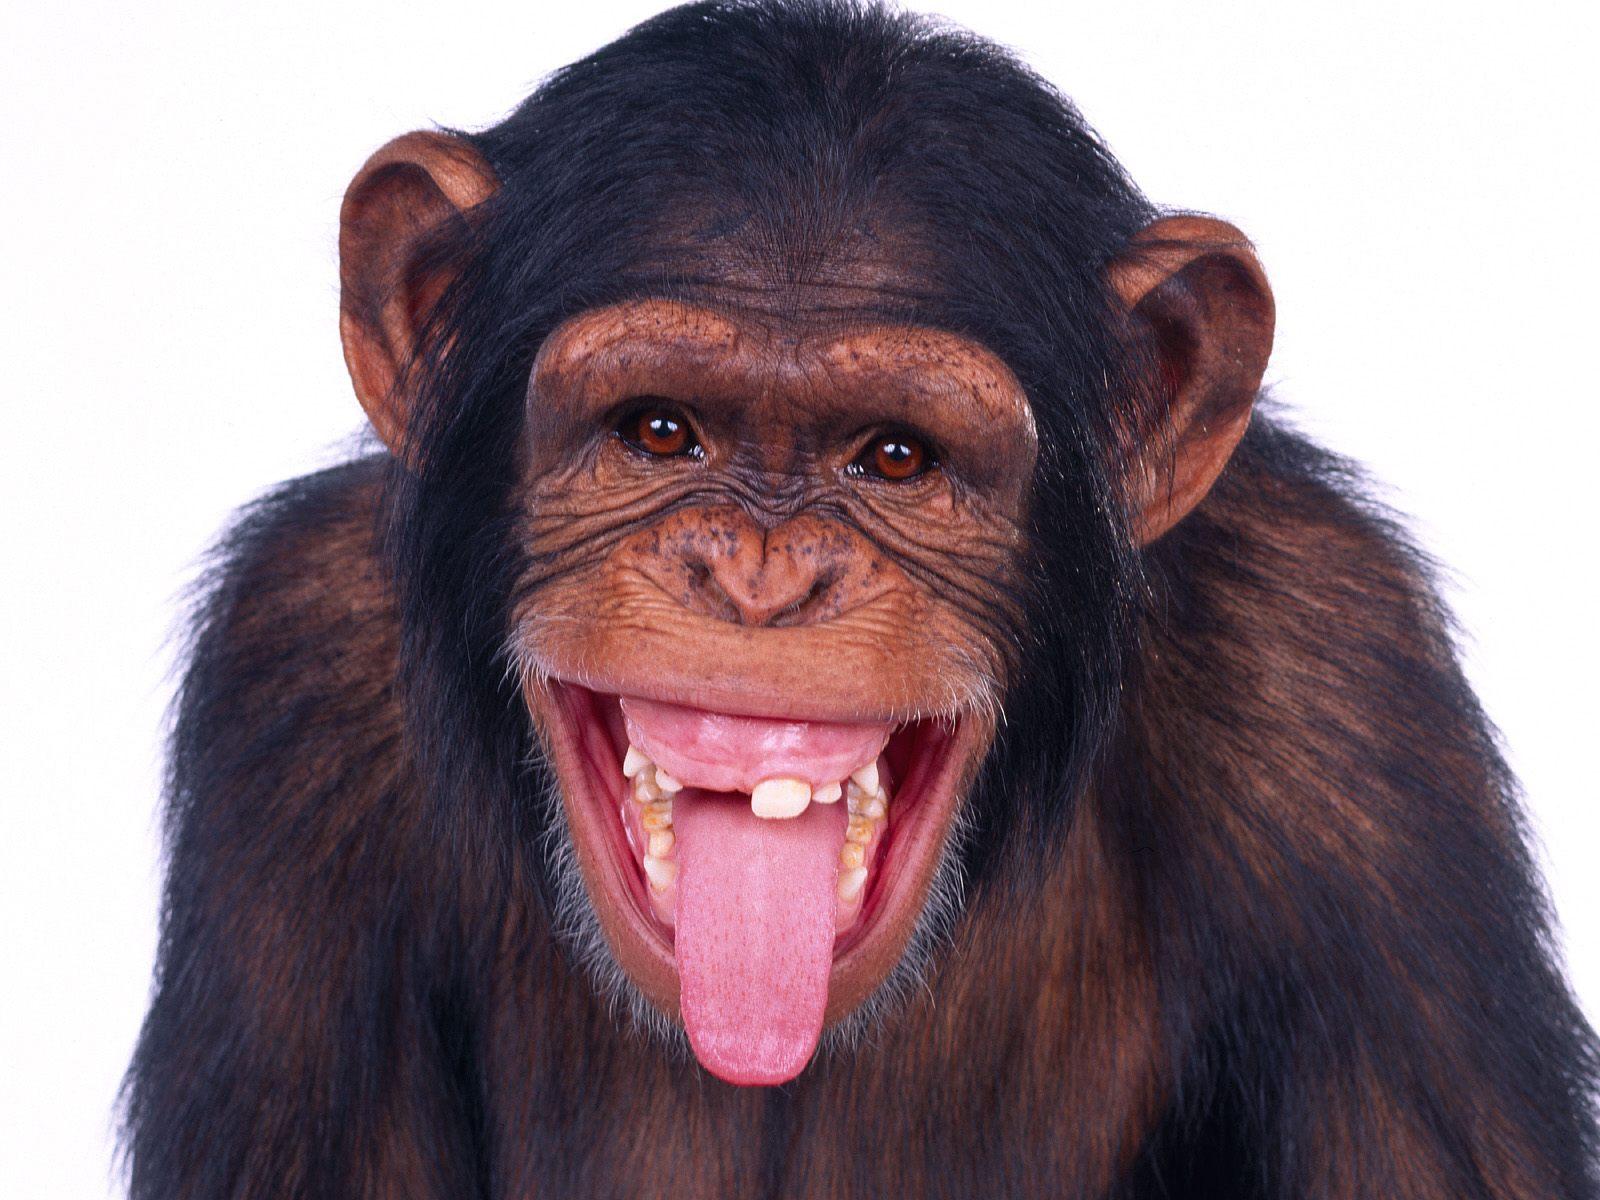 US Gov't Spent $800K To Study Monkey Drool